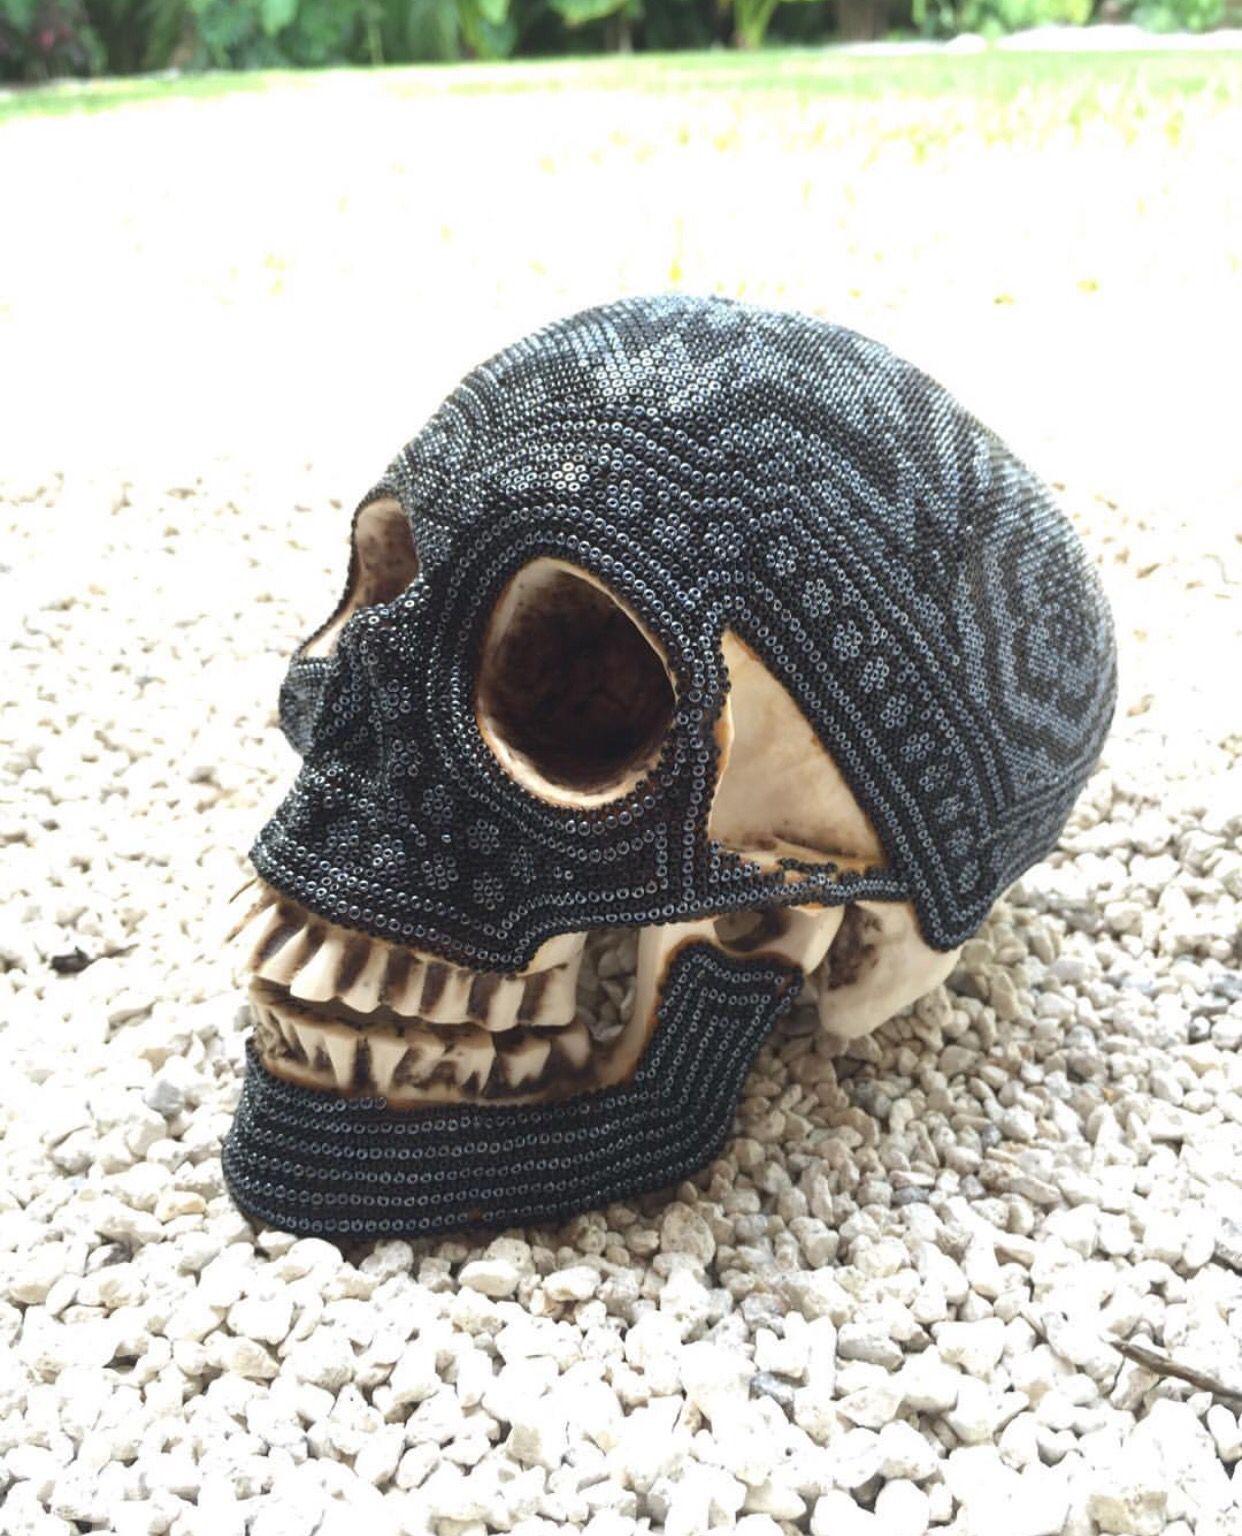 Trabajo Huichol un tesoro de la cultura mexicana!  Cráneo de arte Huichol!  #diademuertos #artelocal #tesorosdemexico #artesanal #artesanoslocales #jalisco #huichol #comerciojusto #hechoamano #craneos #siguenosenfacebook  Huichol work a treasure of Mexican culture!  Huichol skull! #halloweenart #localart #treasuresofmexico #skull #love #artisanal #handmade #fairtrade #followme #like4like #huichol #followusonfacebook #origenlocal